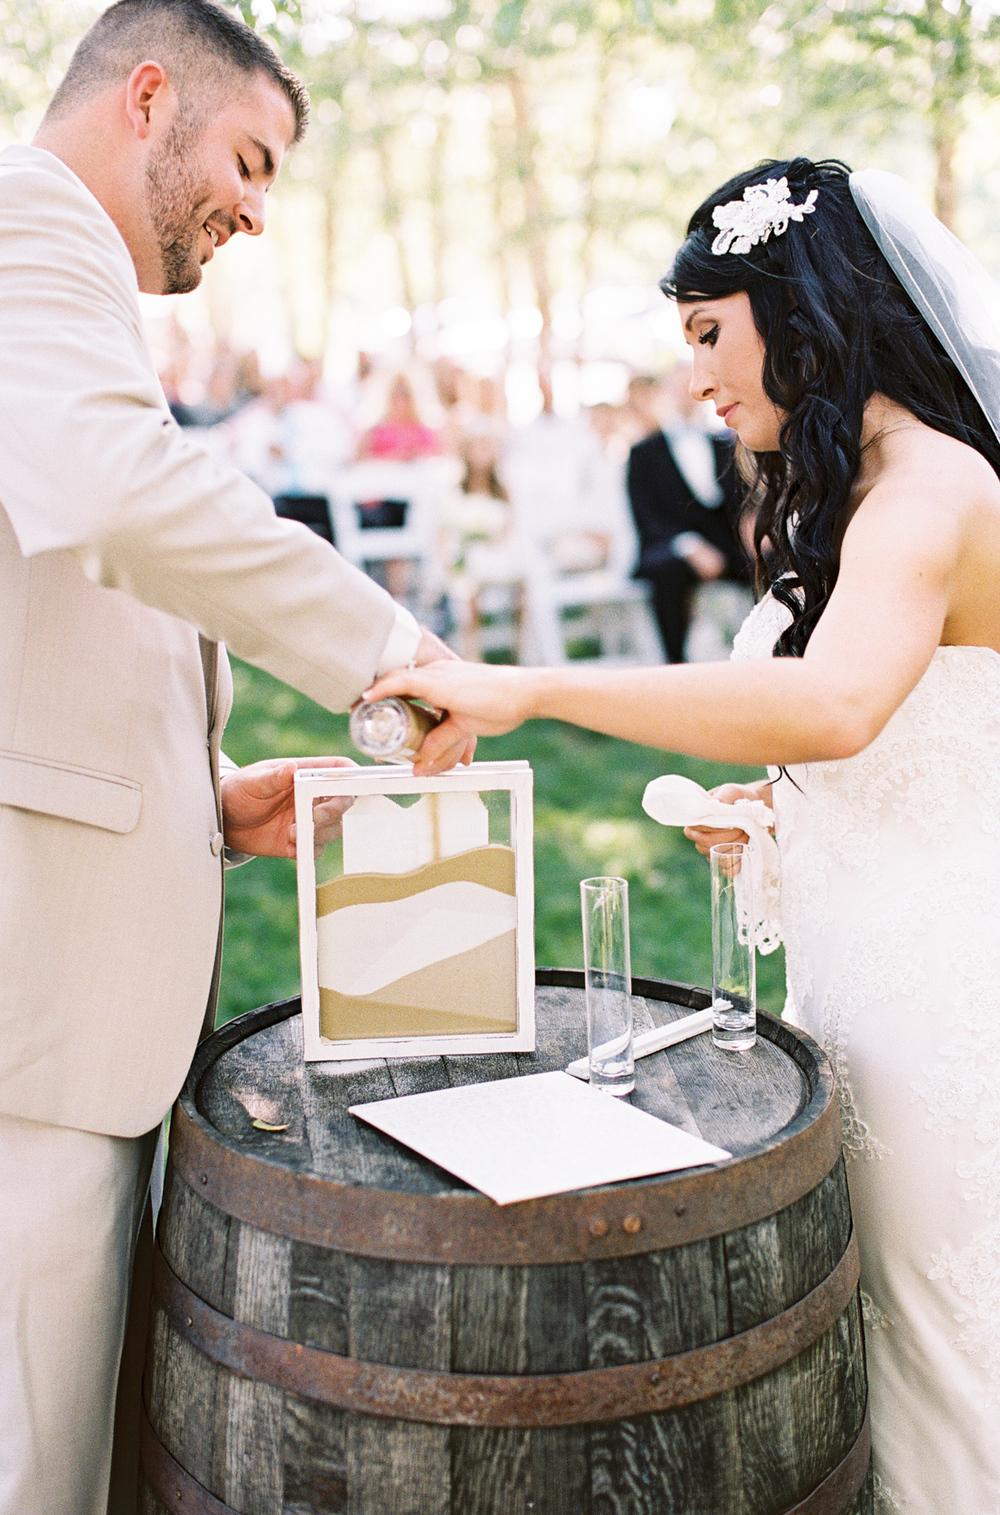 mcguires-millrace-farm-wedding-030.jpg